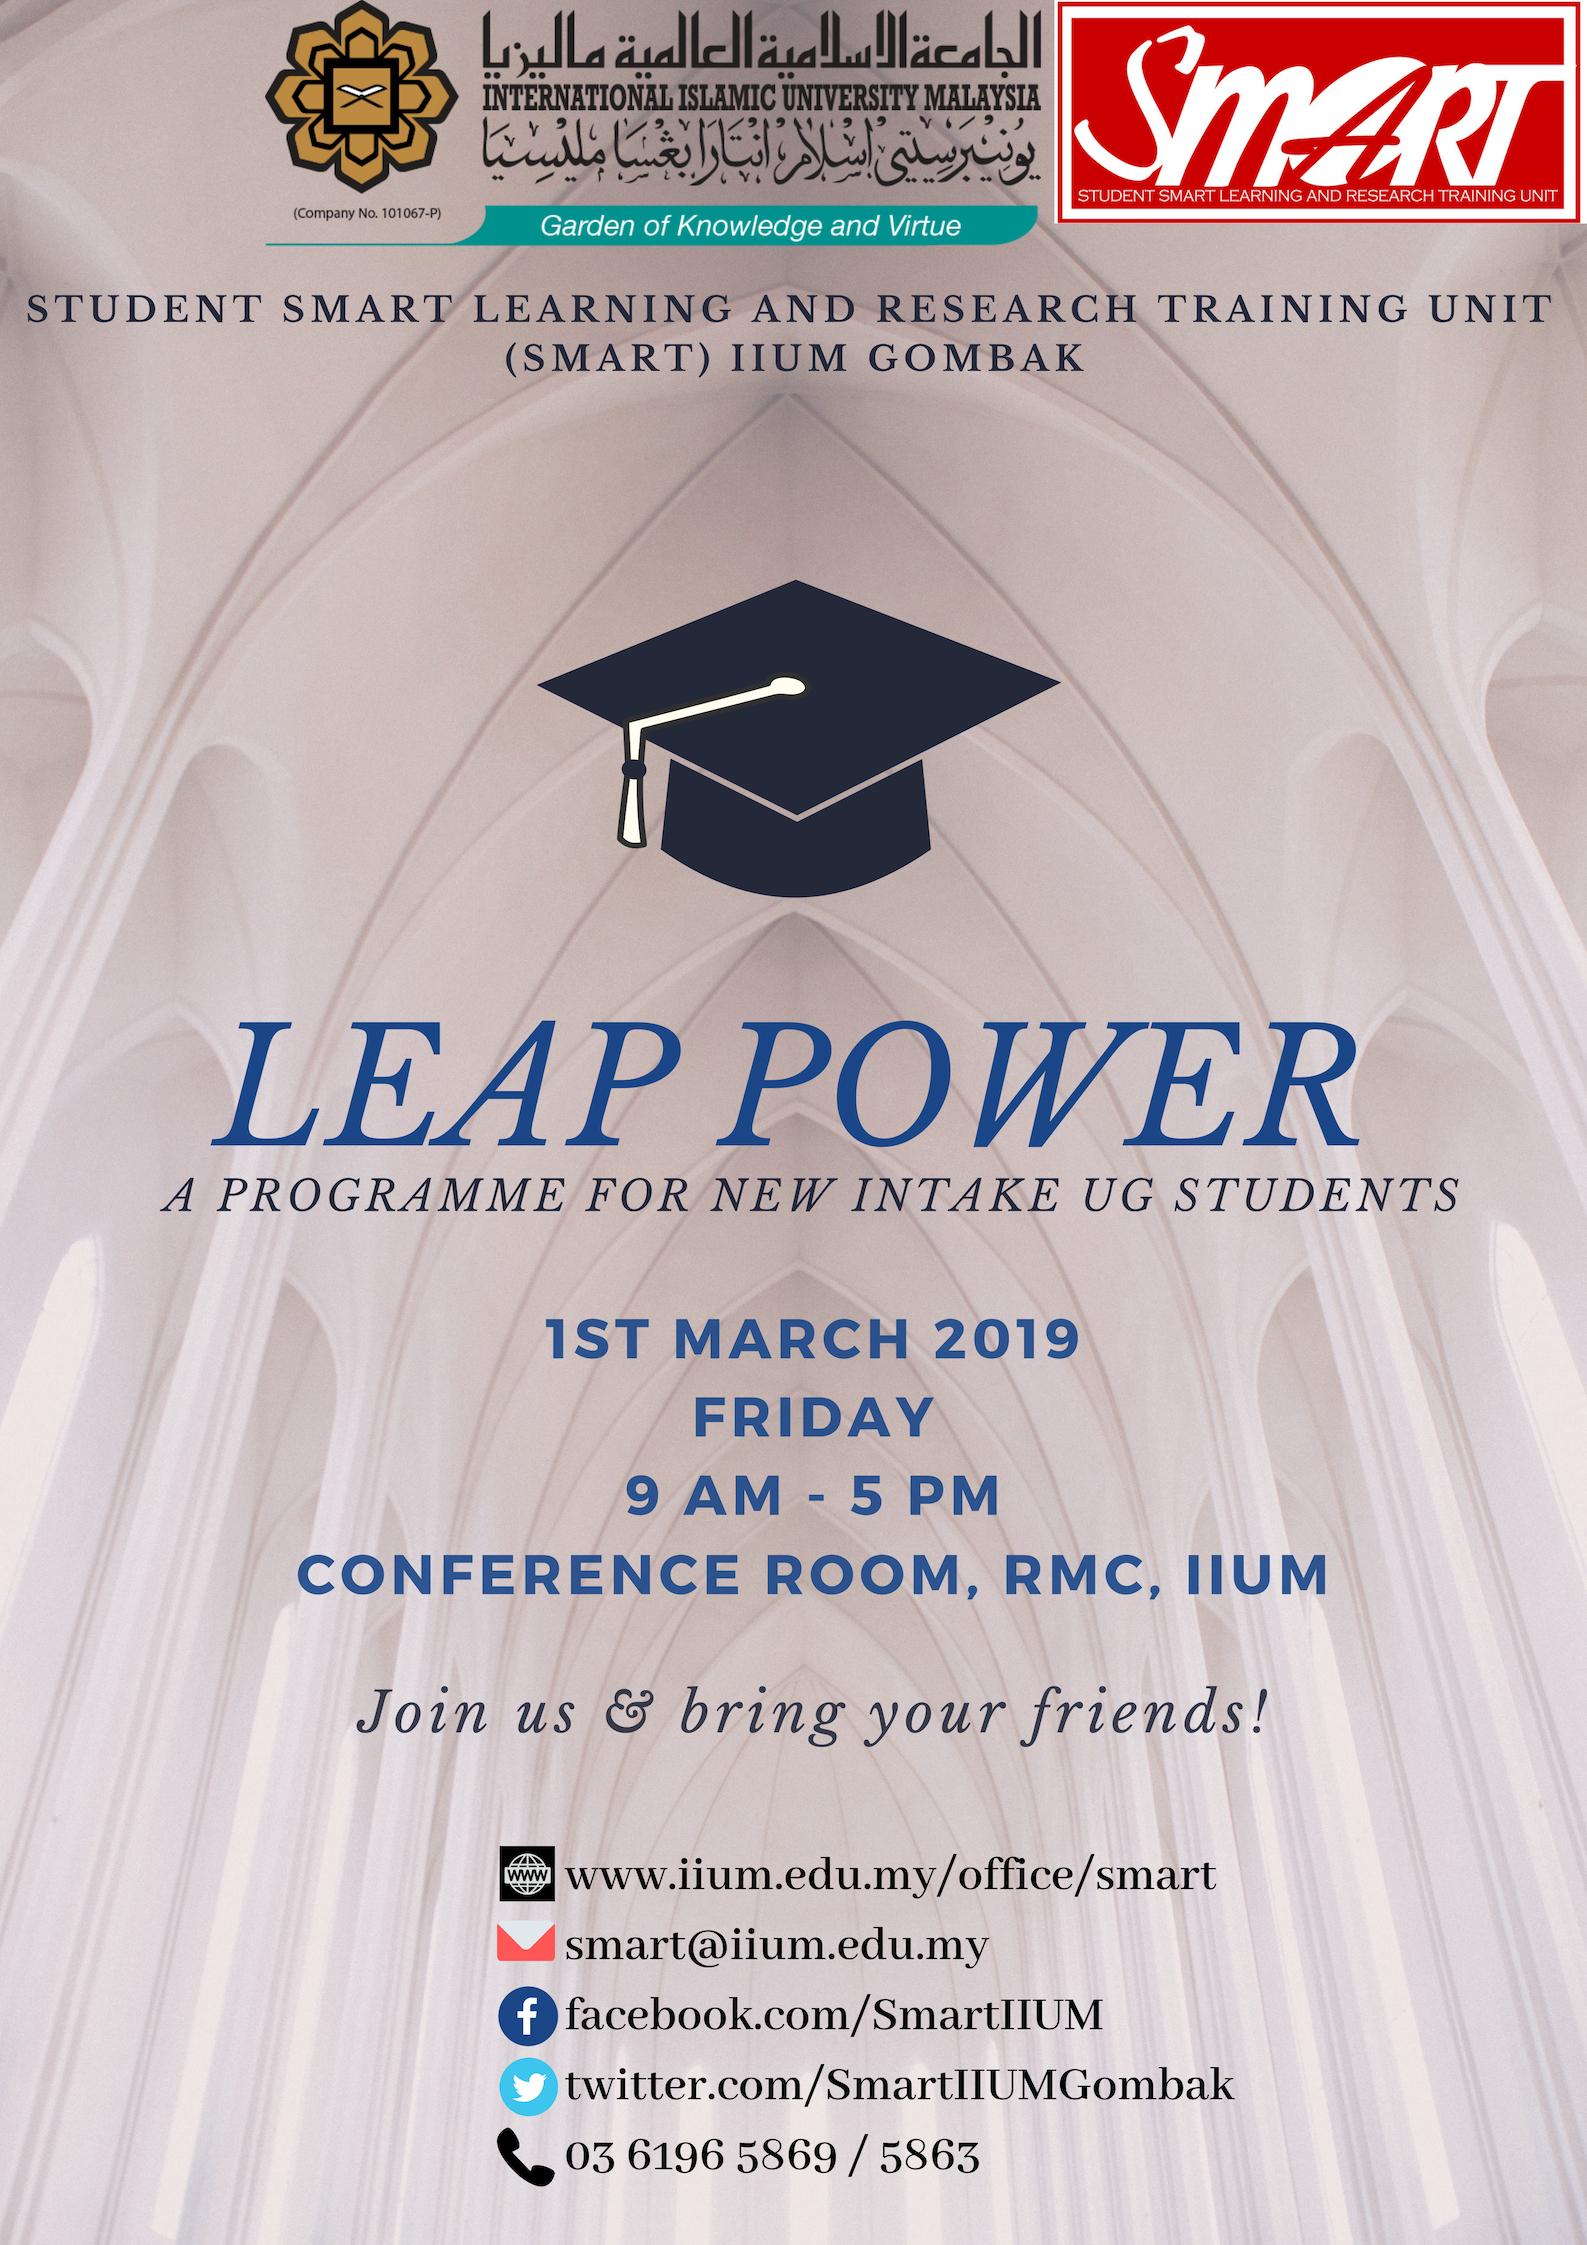 LEAP POWER FOR UG INTAKE, SEM 2 2018/2019